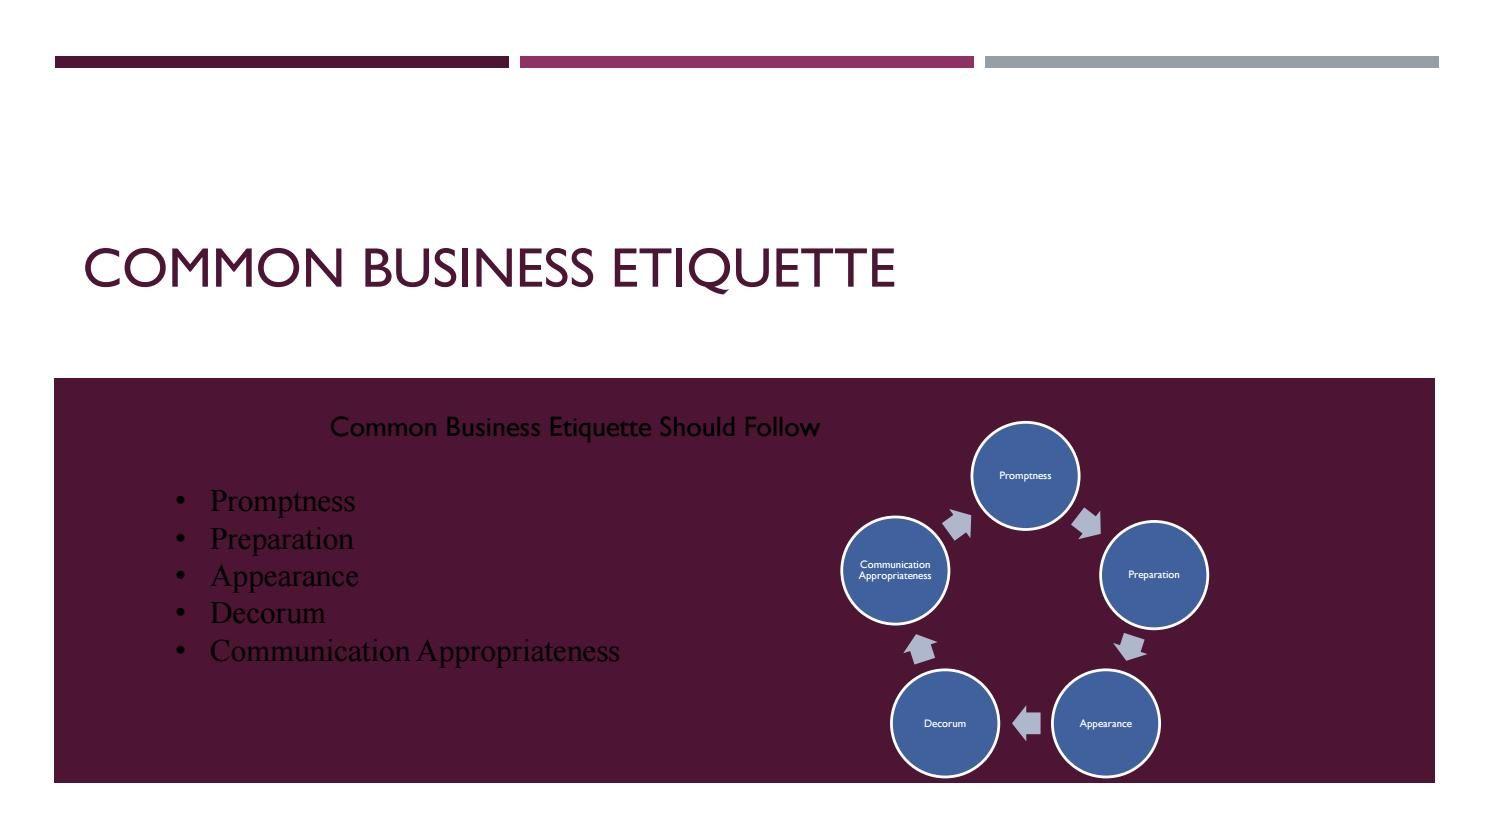 Common business etiquette business etiquette business